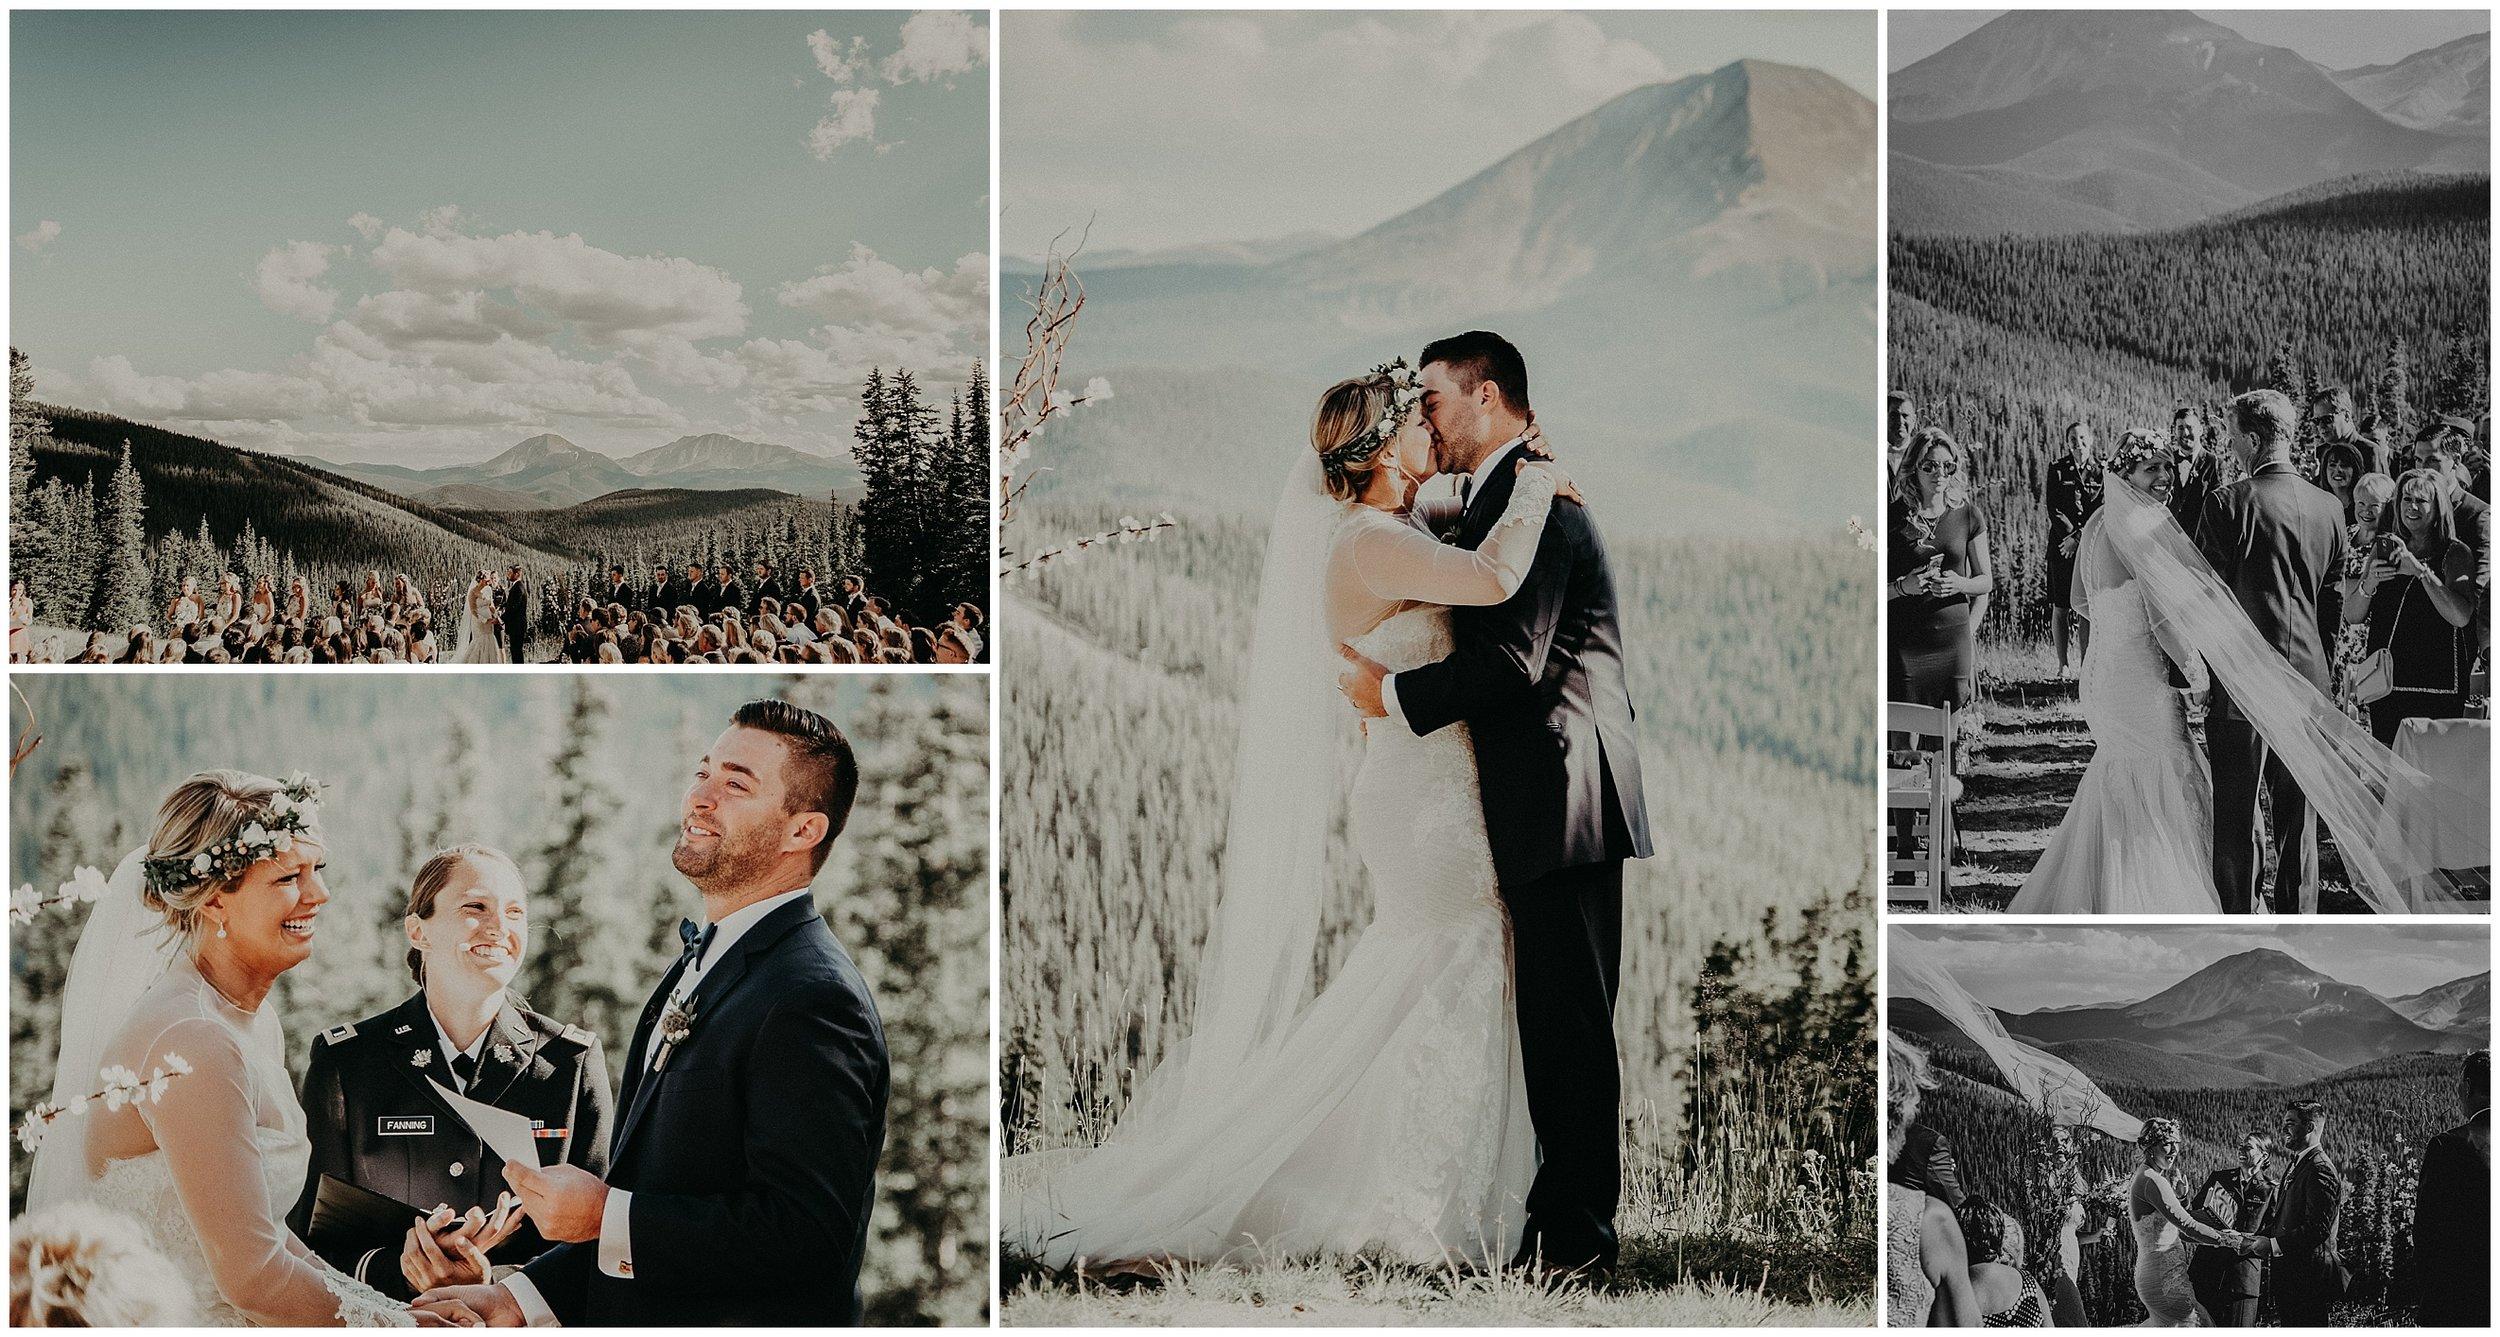 Taylor_English_Photography_Keystone_Colorado_wedding_0009.jpg